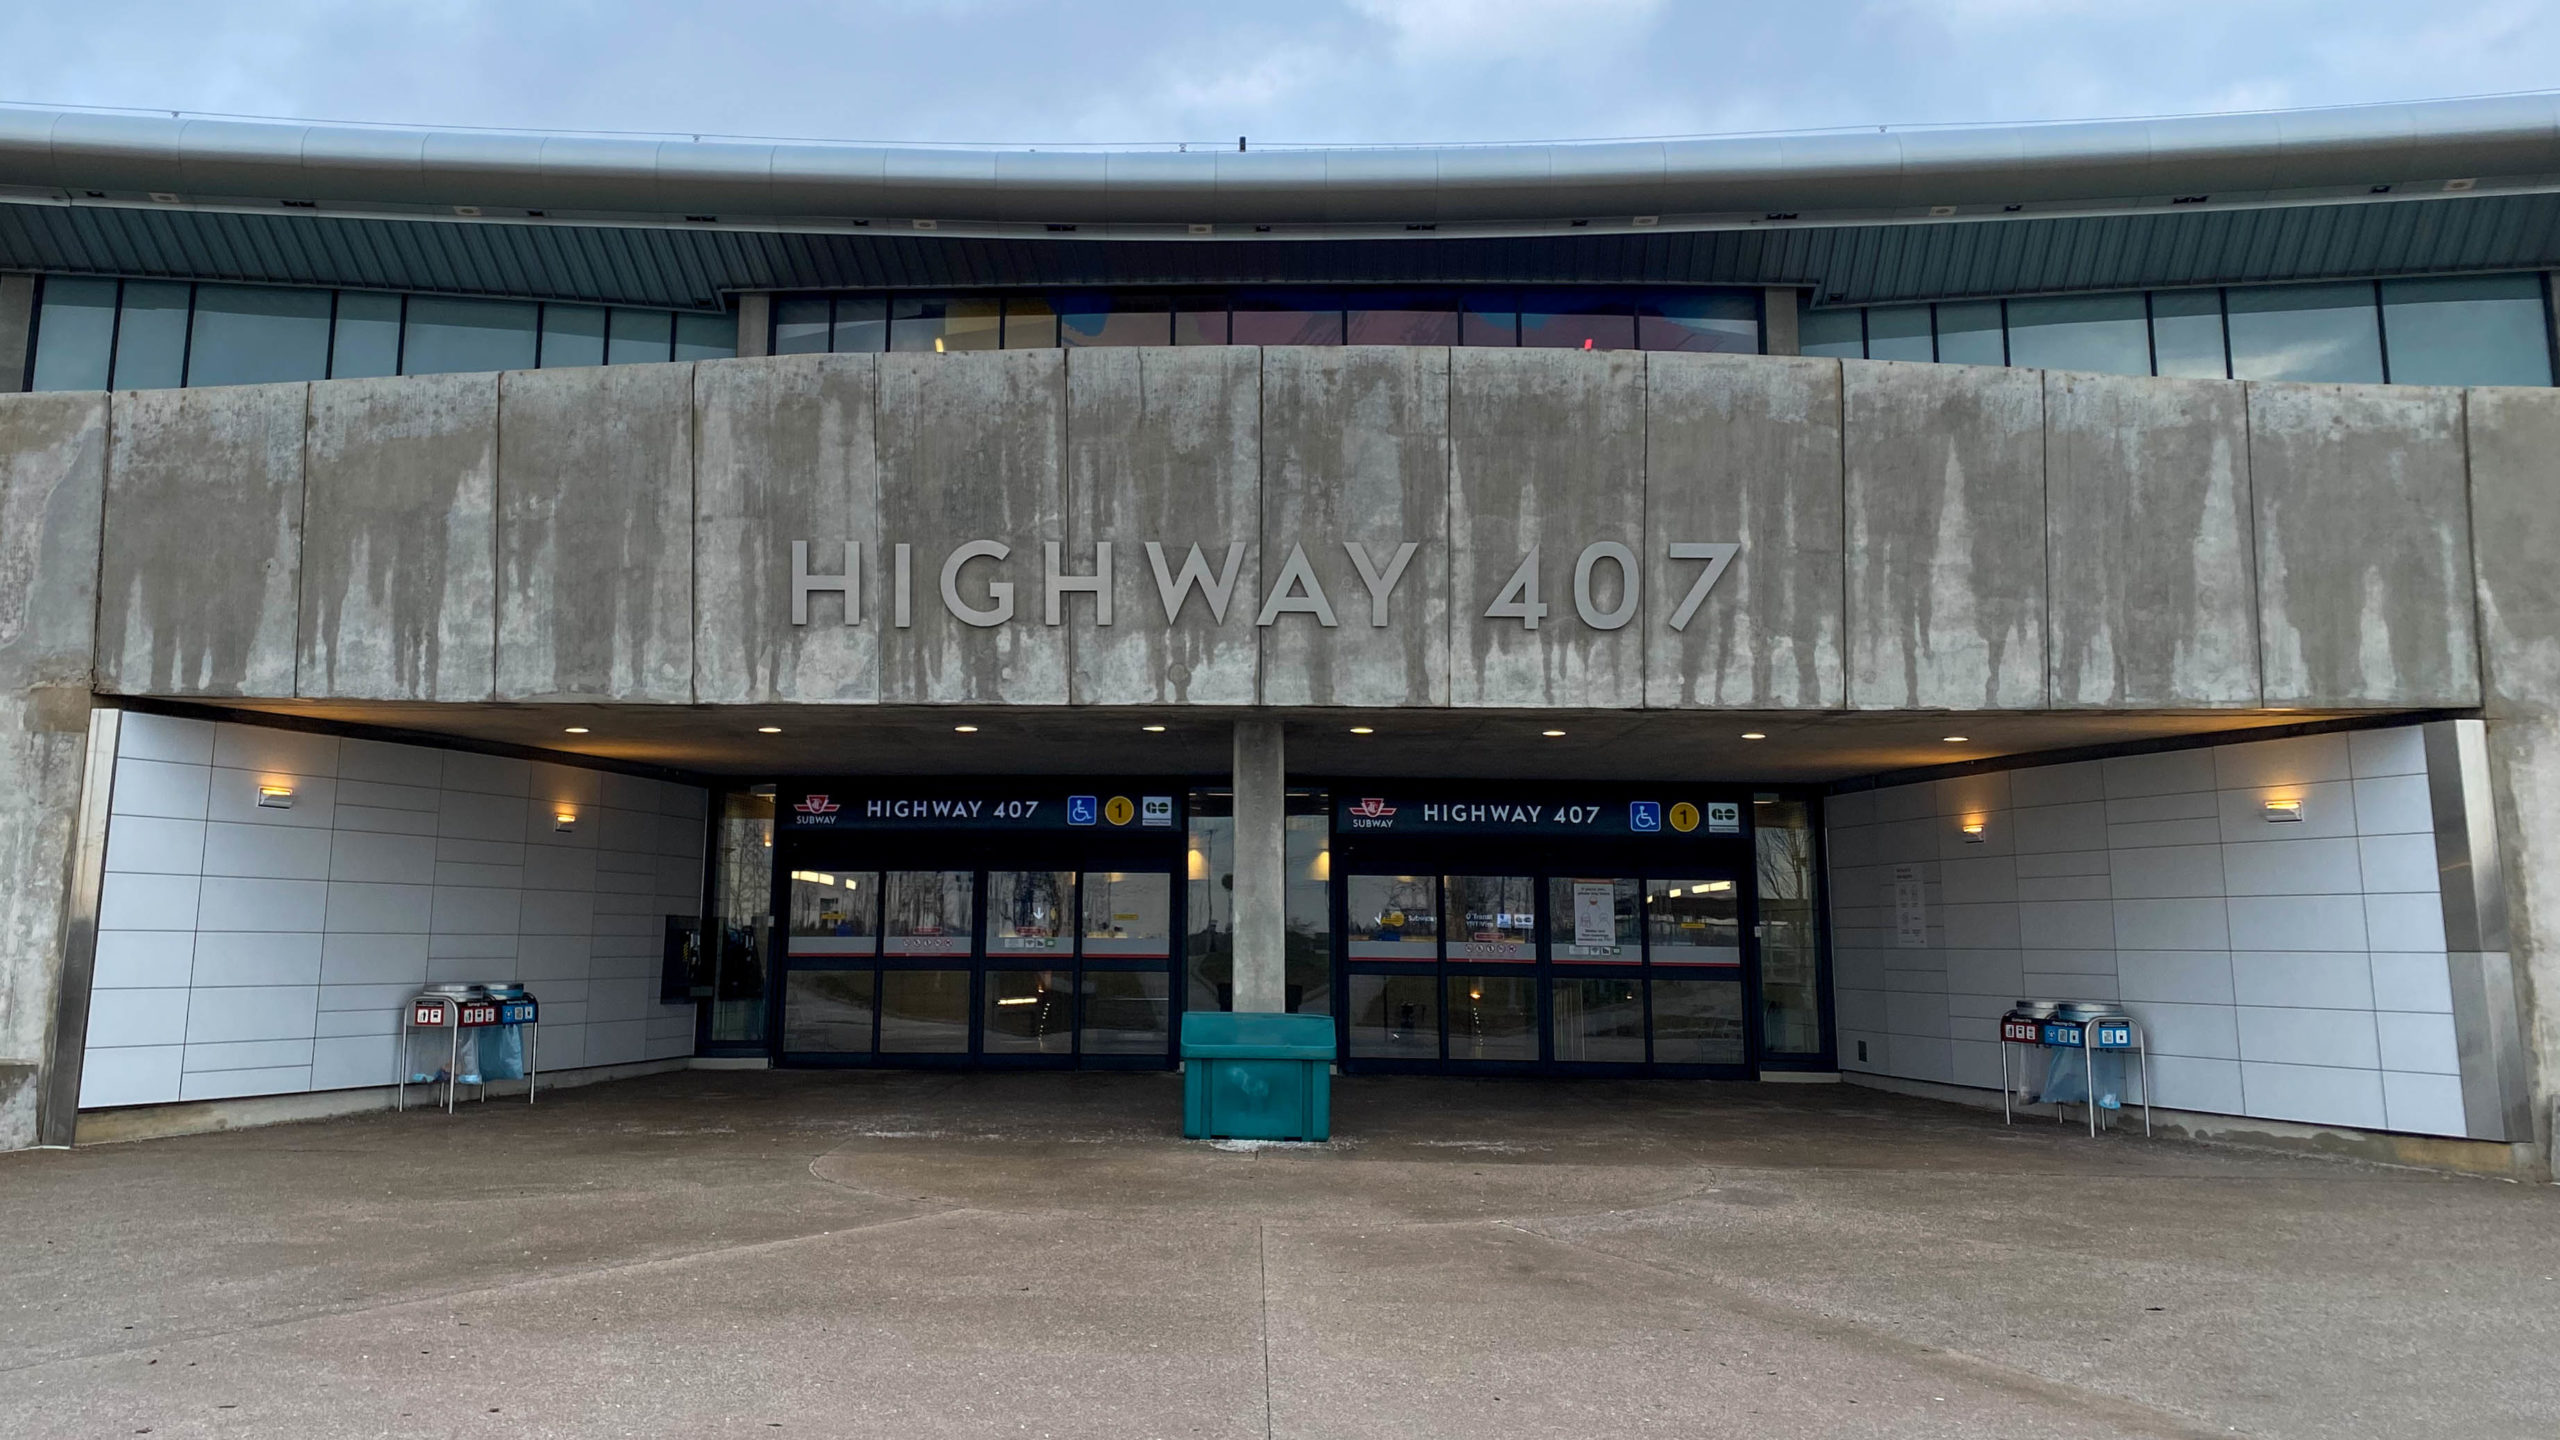 Highway 407 TTC Subway Entrance